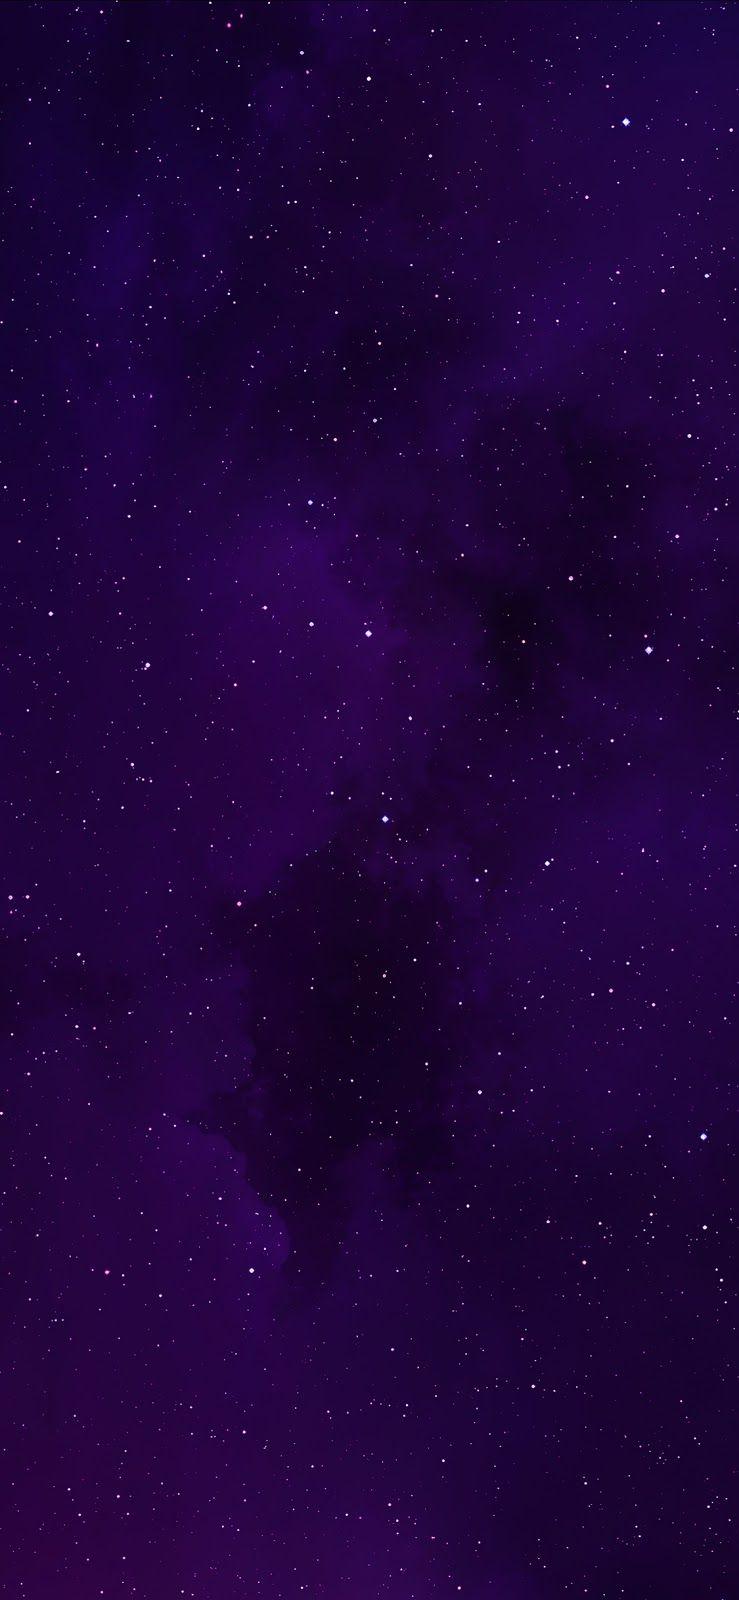 Space Iphone X Purple Wallpaper Iphone Purple Galaxy